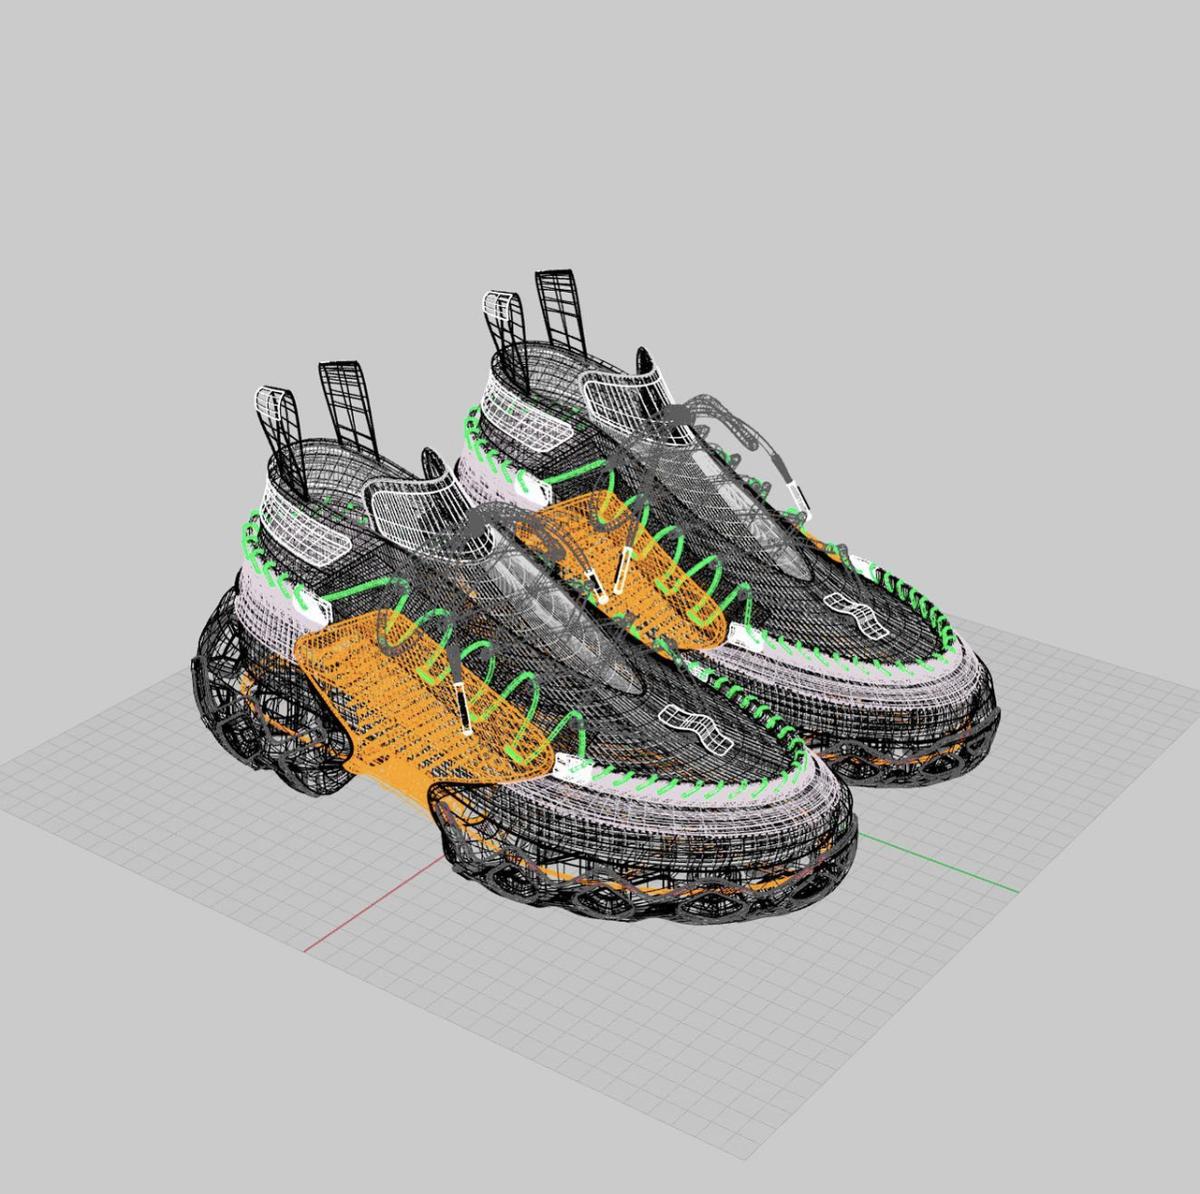 Nicholas Maloy Shares Process Behind Latest Concept http://conceptkicks.com/nicholas-maloy-shares-process-behind-latest-concept/… #shoedesign #footweardesign #sneakerdesign #industrialdesign #productdesignpic.twitter.com/HpJeBVyGWB